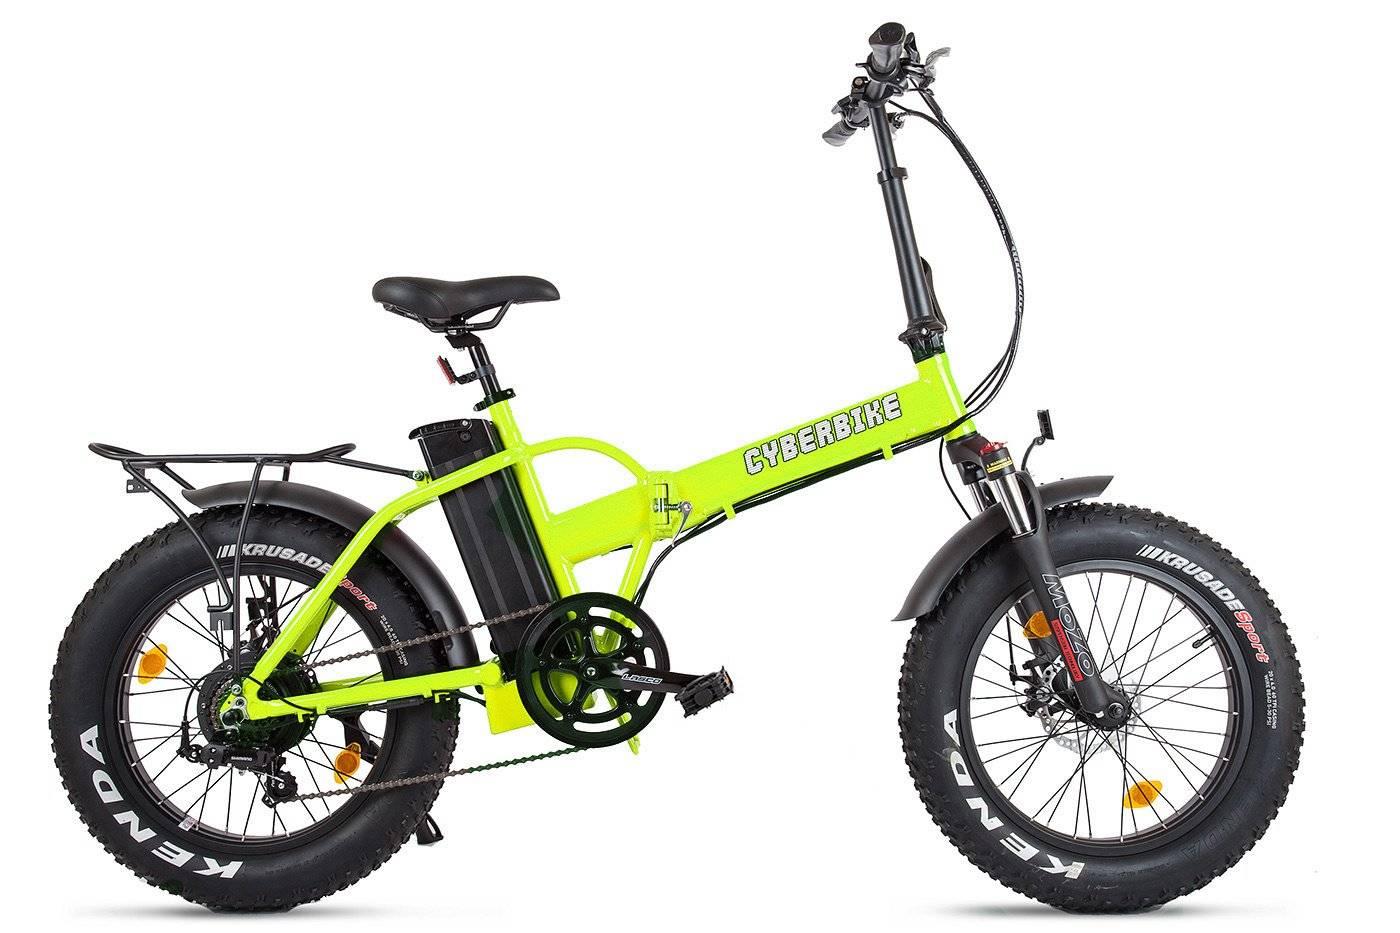 Велогибрид Cyberbike 500 Вт, 019282-1906, фото 6